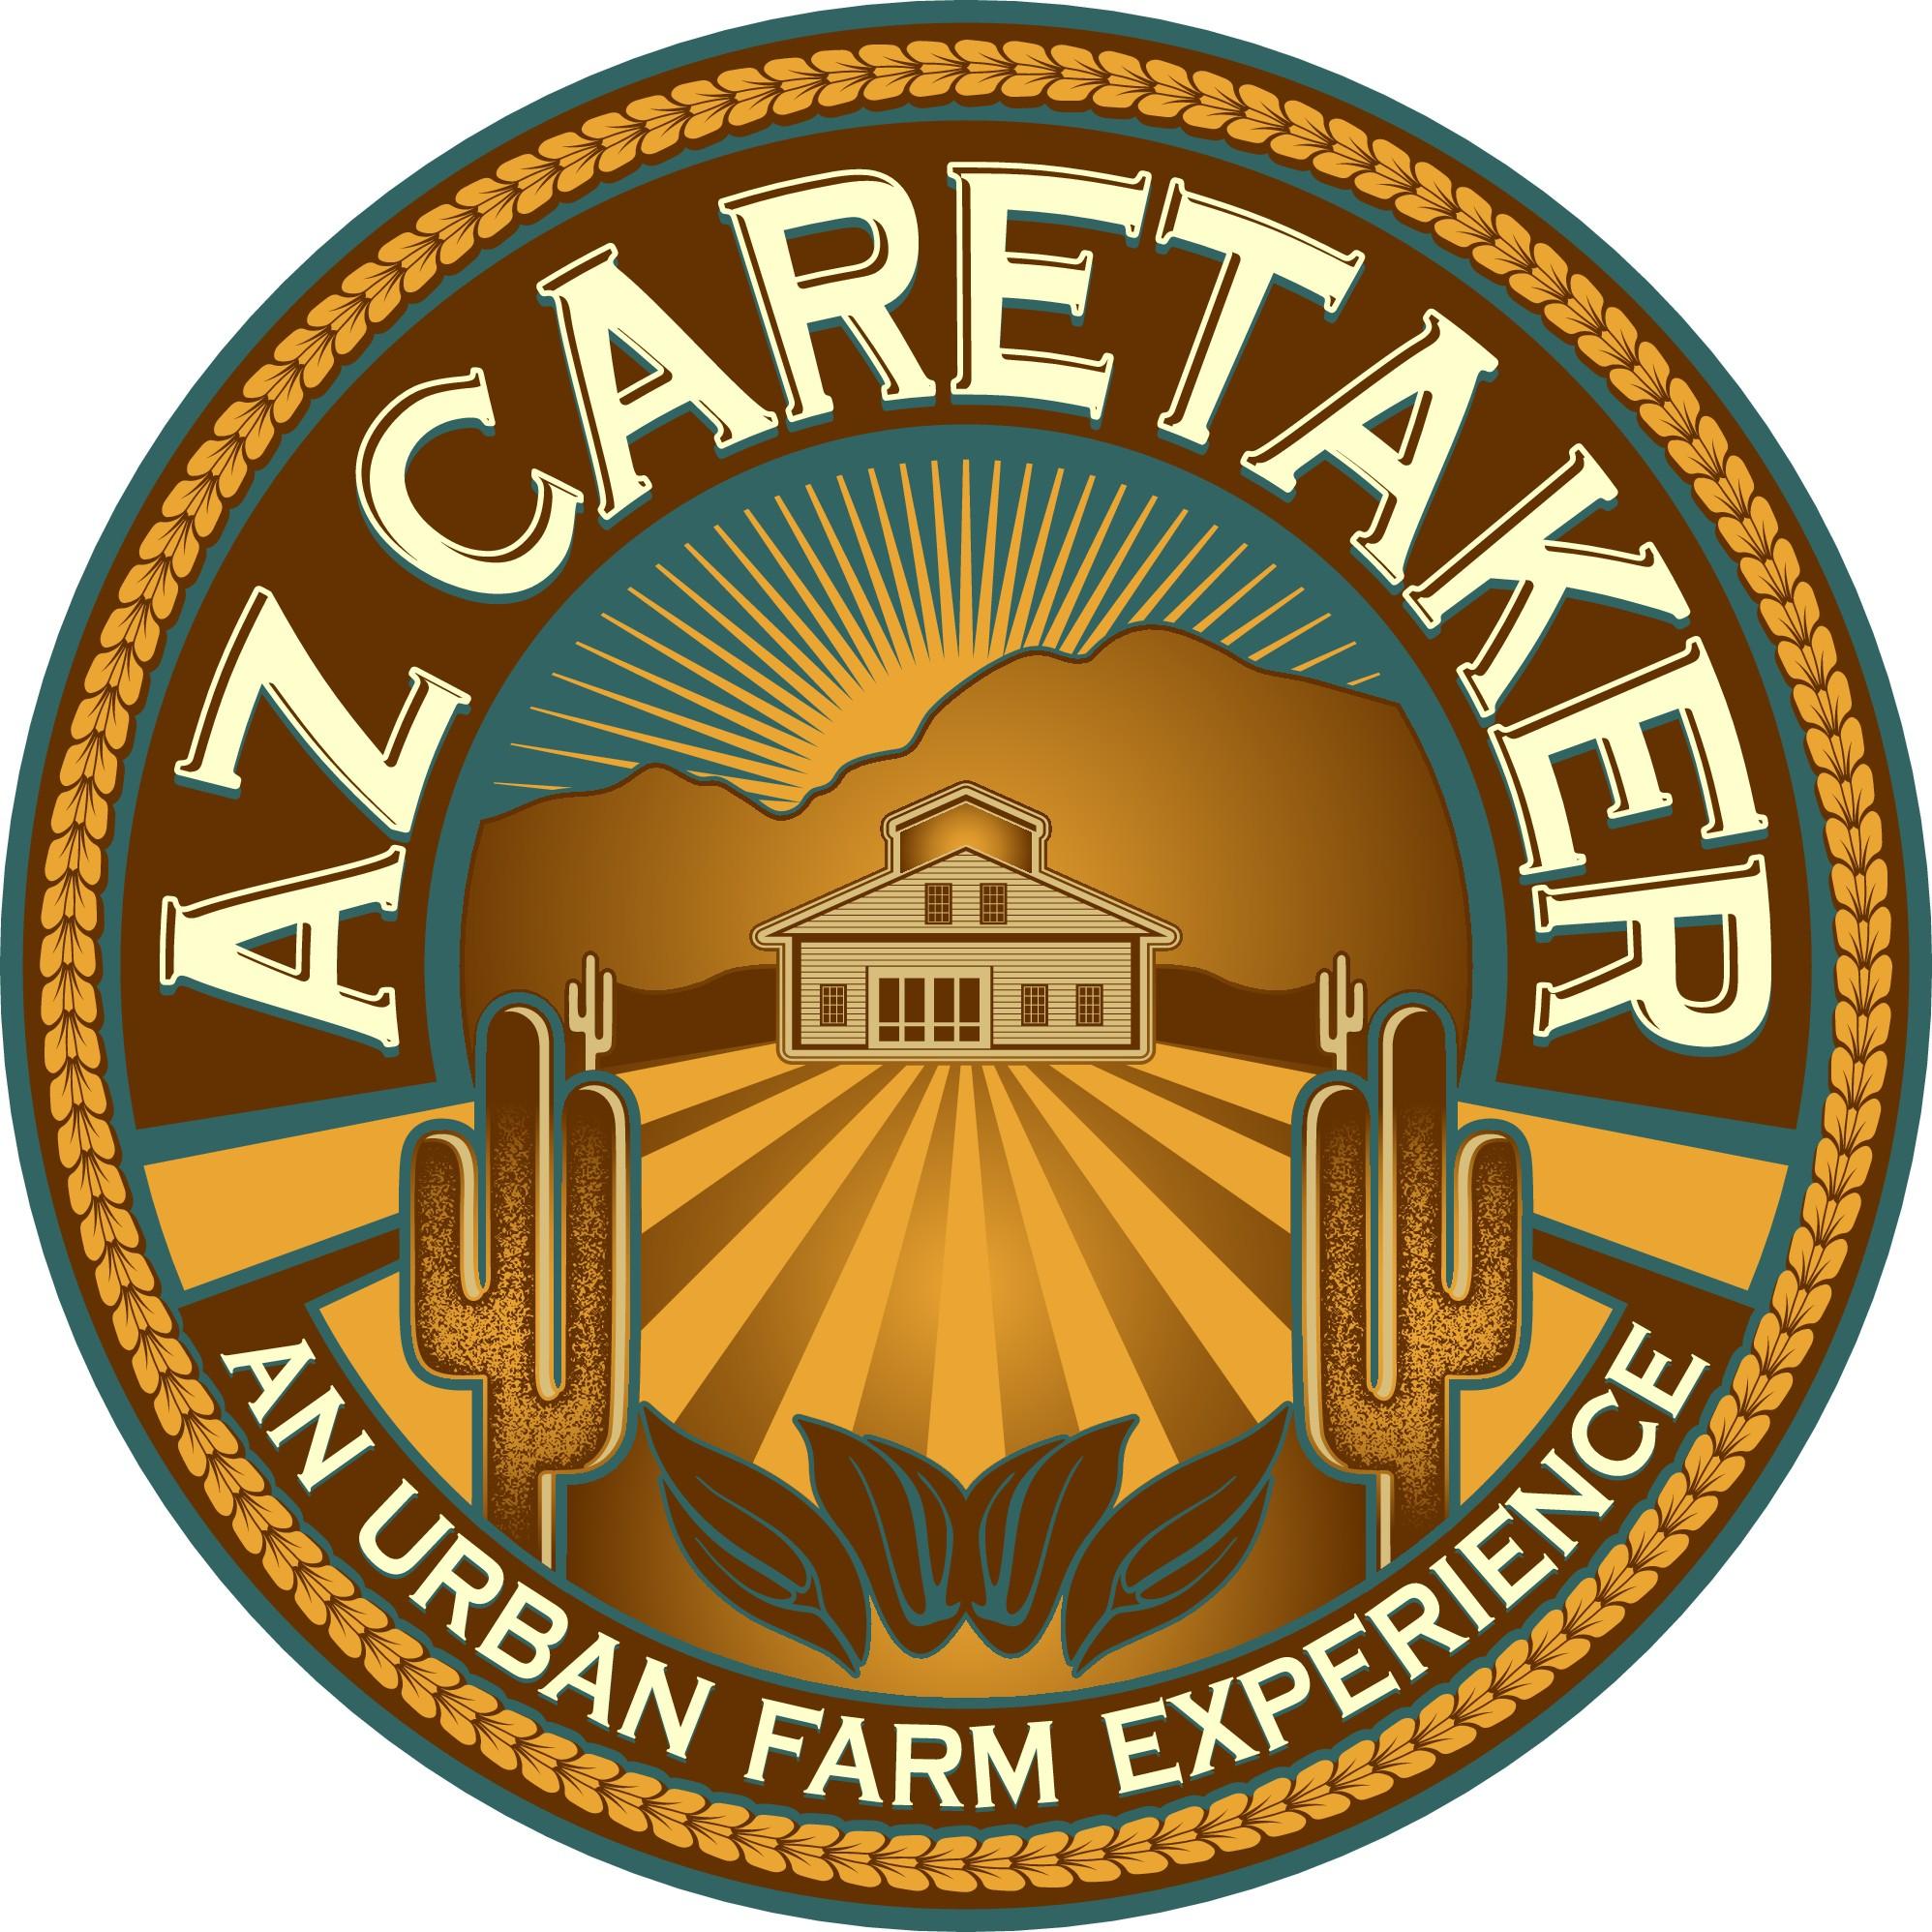 Create an inspirational logo/social media for an urban farm in the Sonoran desert (Arizona)